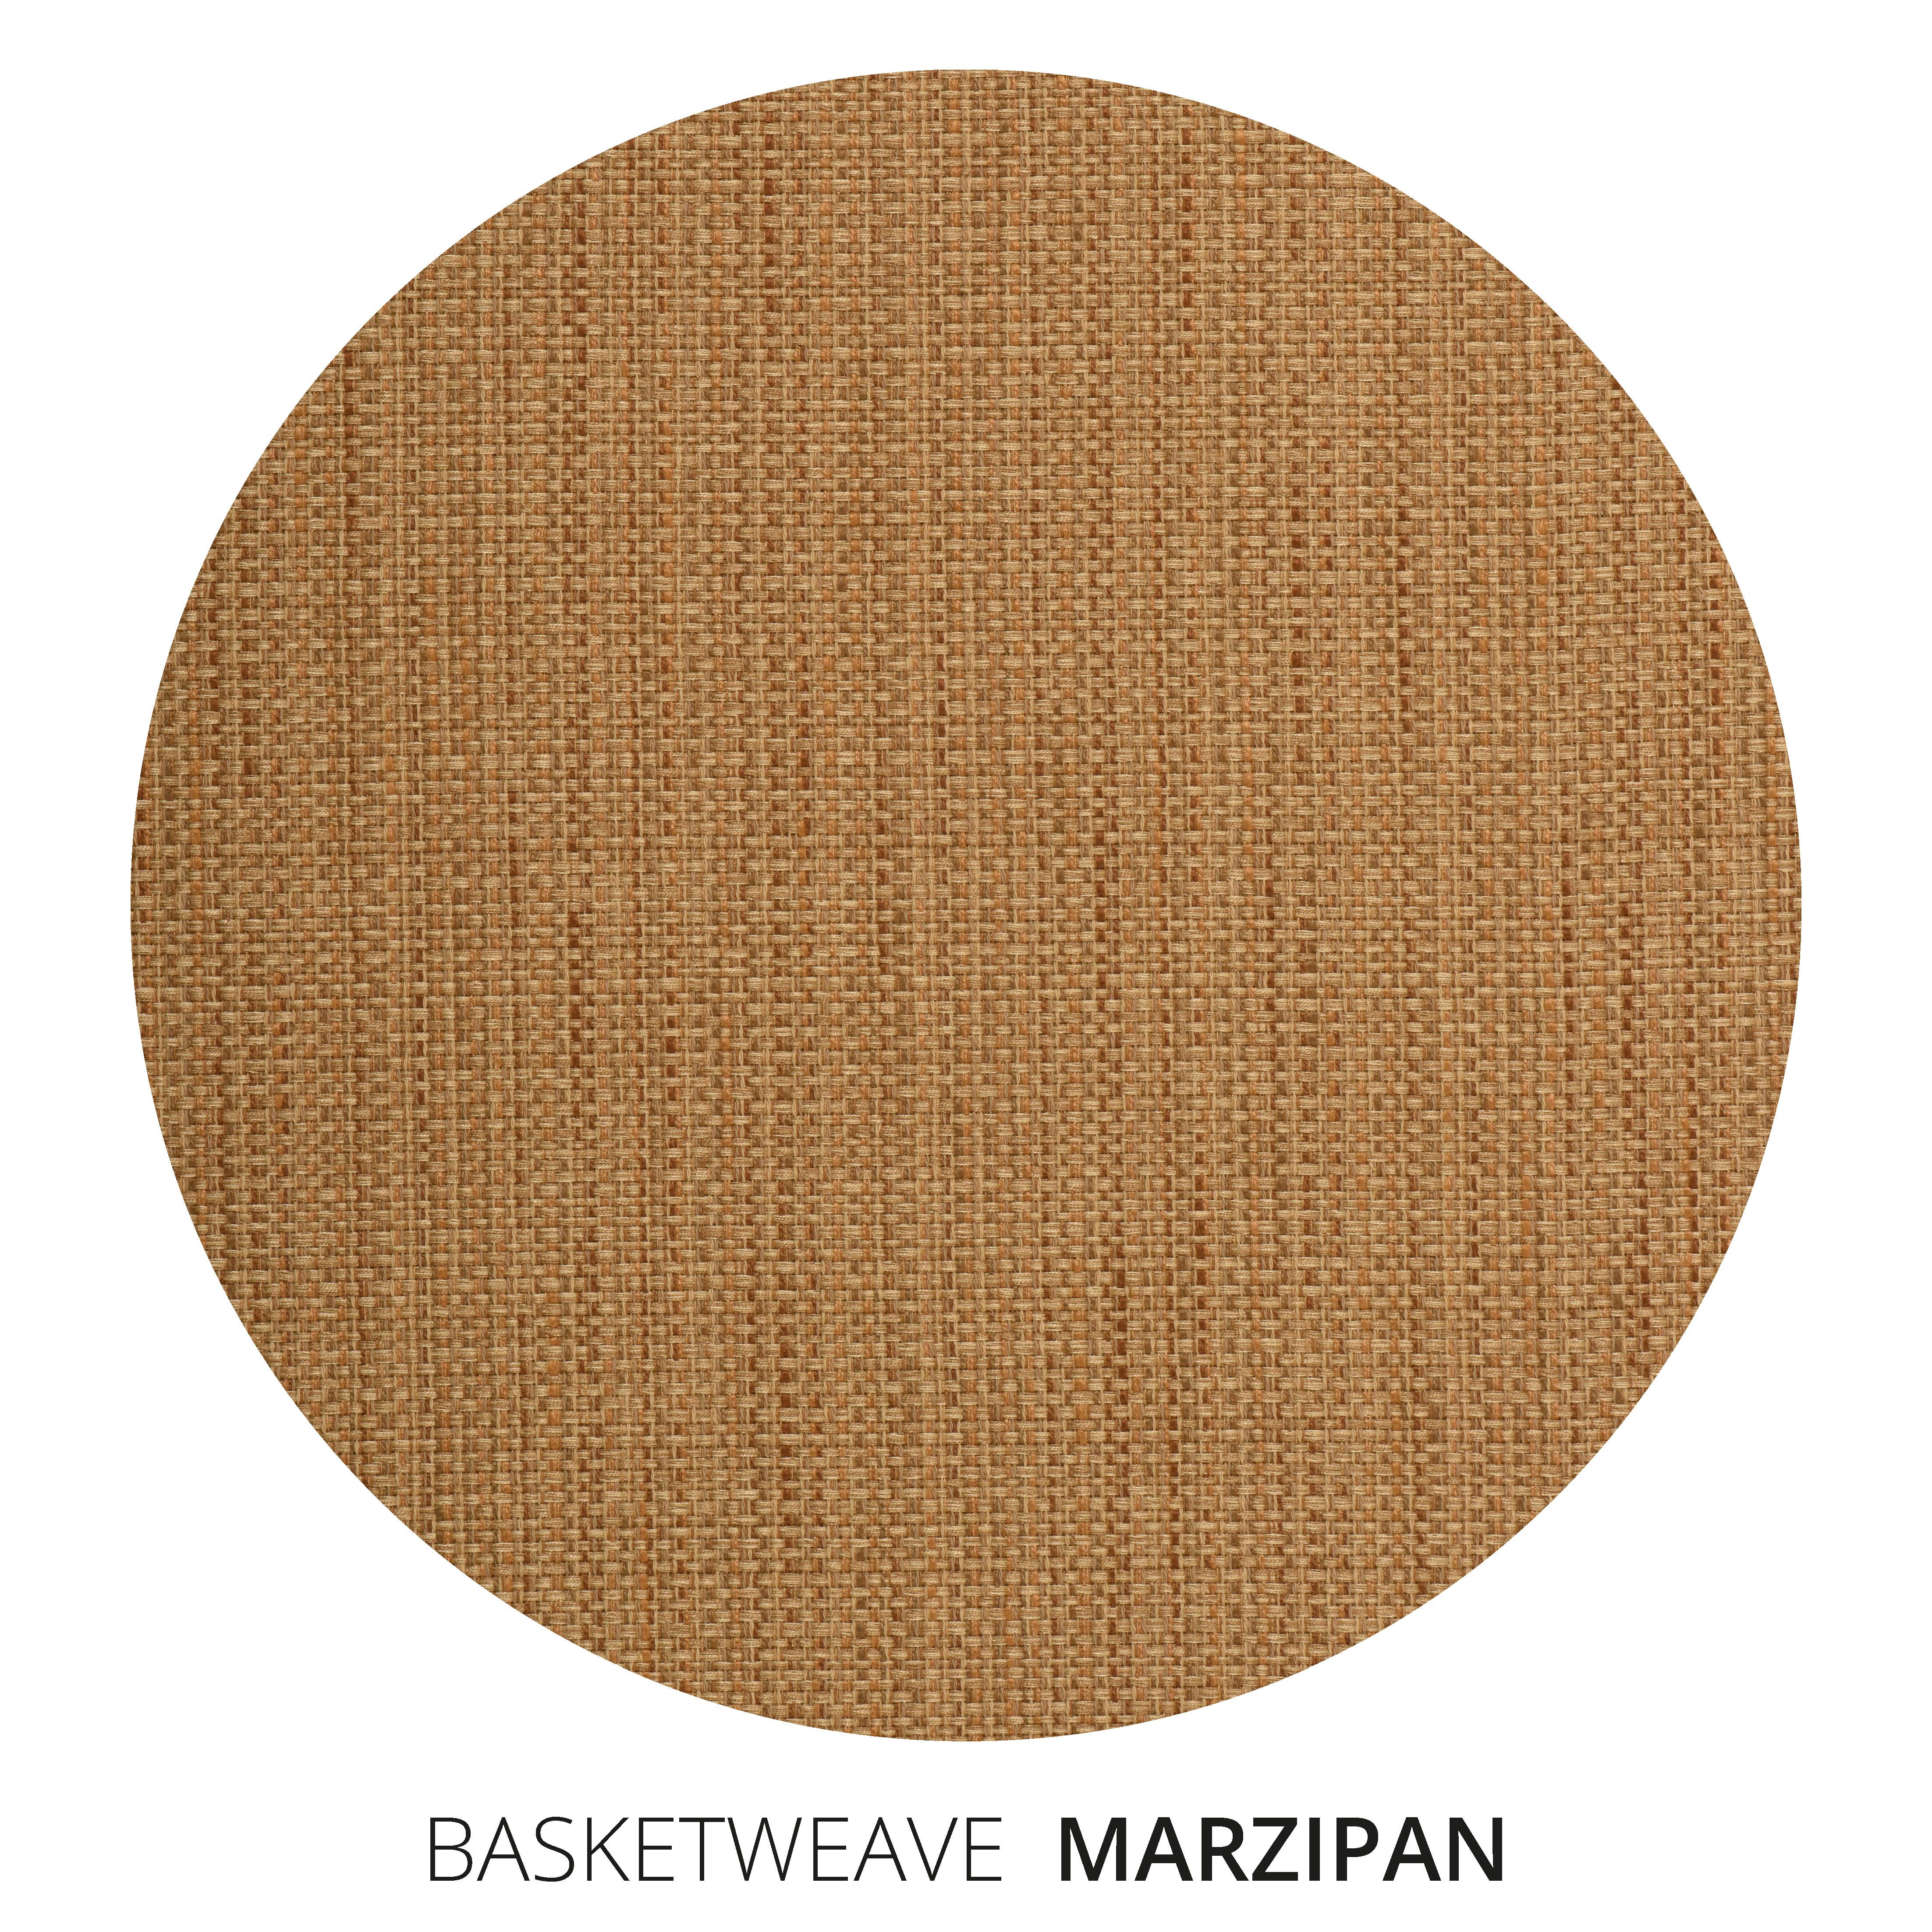 Marzipan Basketweave Swatch